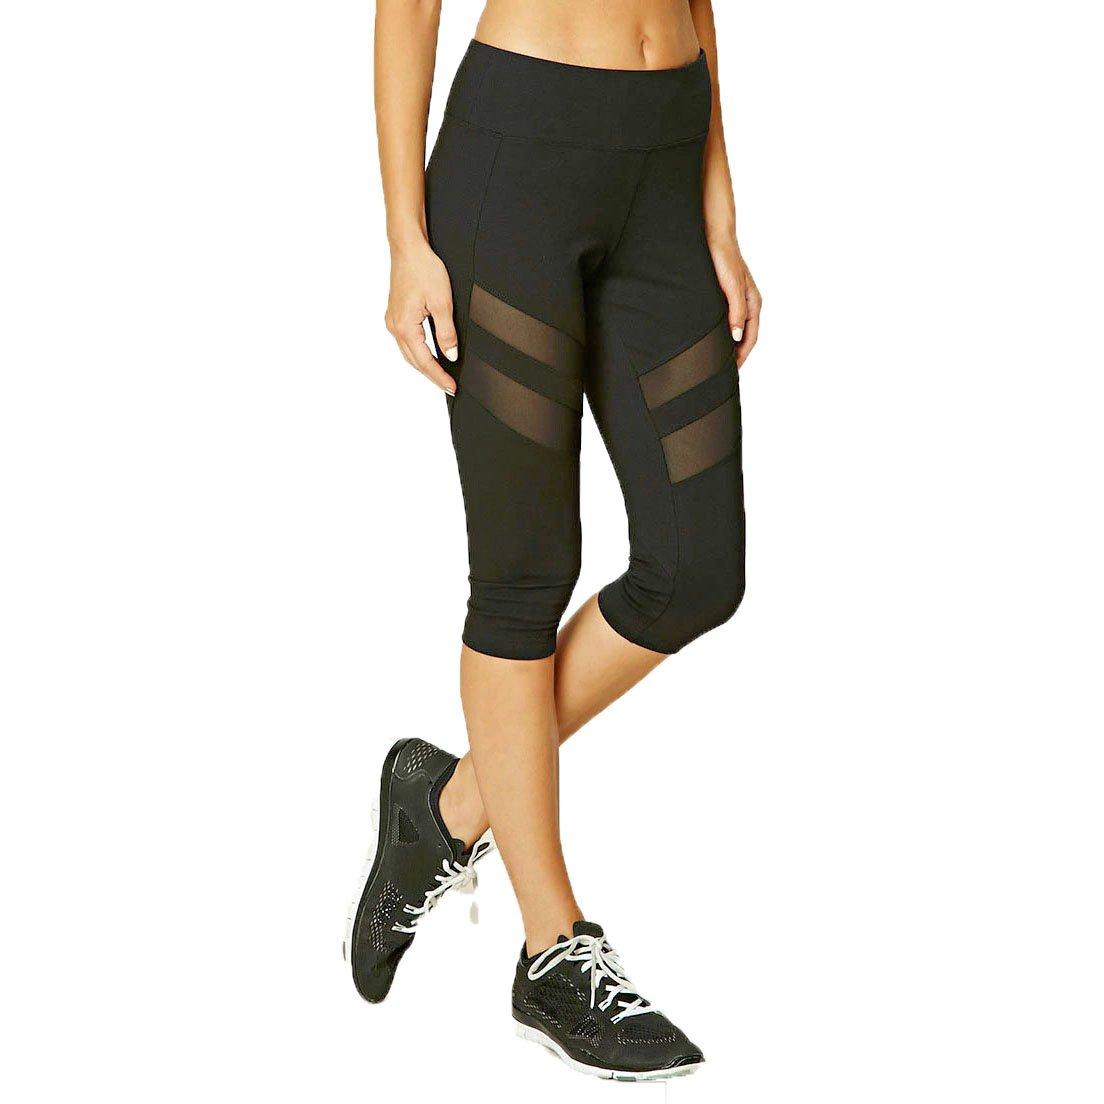 Capri Yoga Fitness Tights Leggings Pants